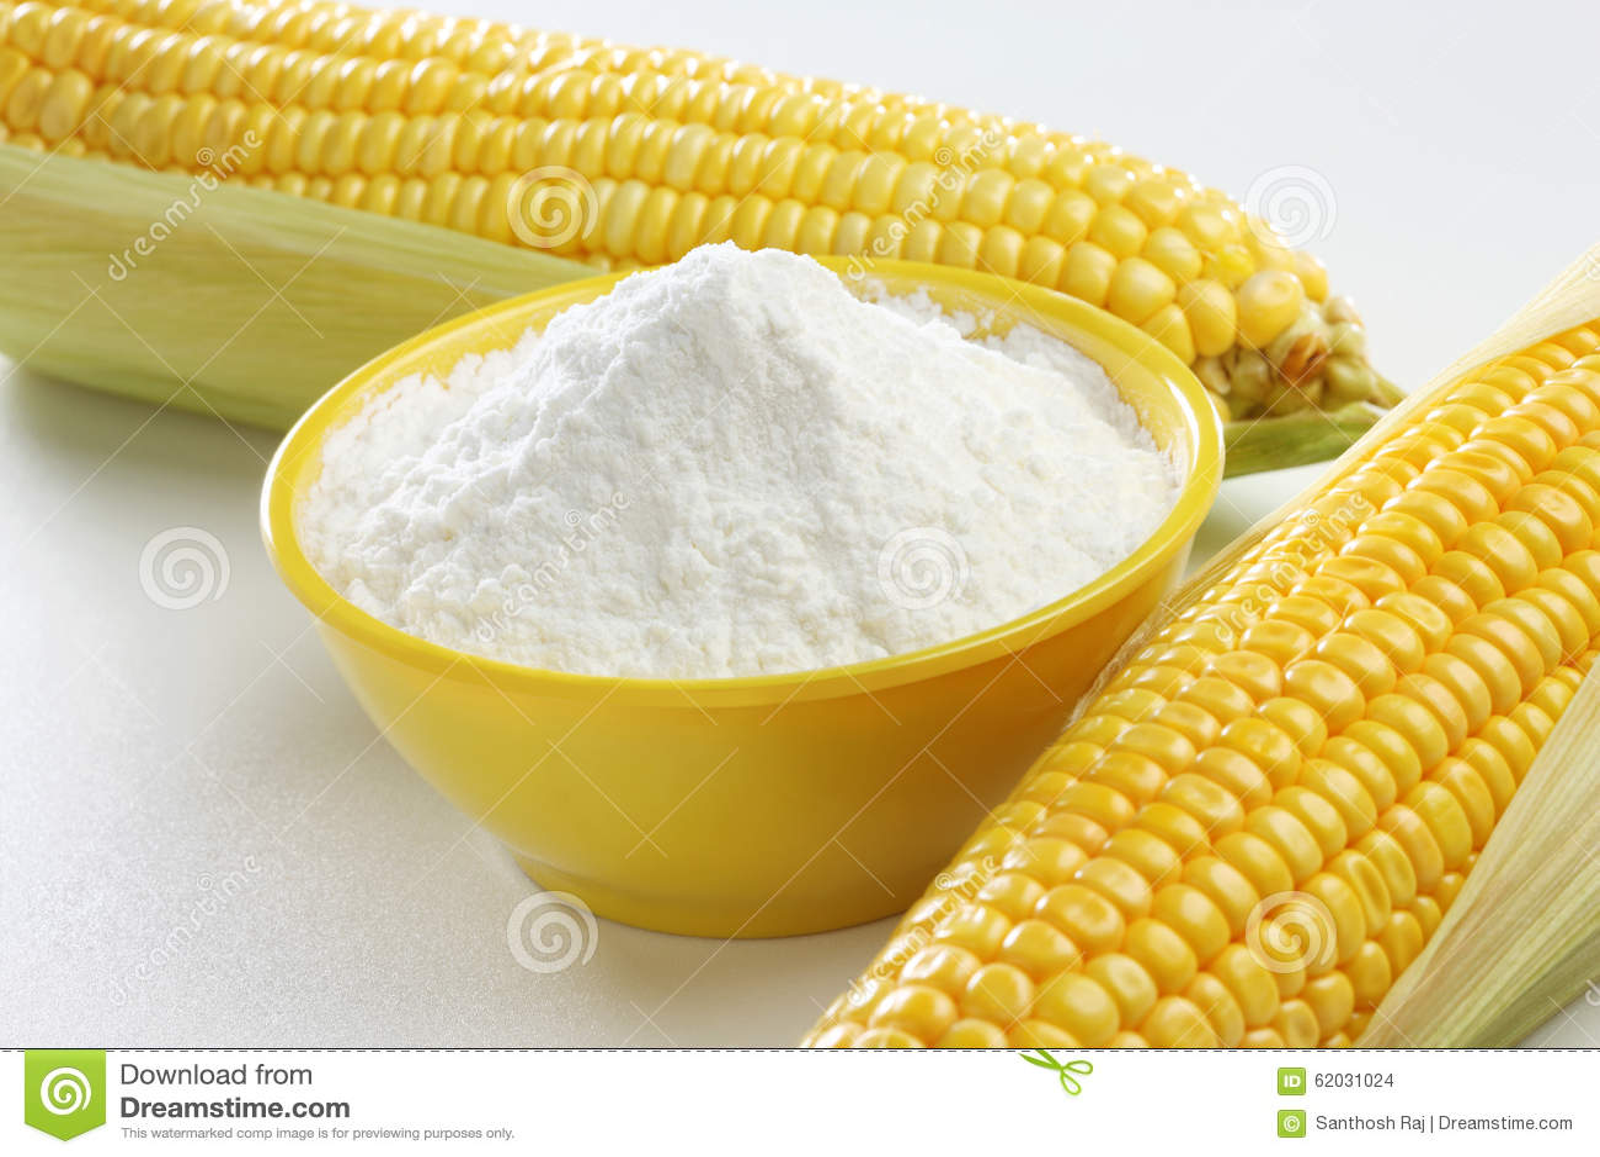 recipe: cornstarch or flour [34]